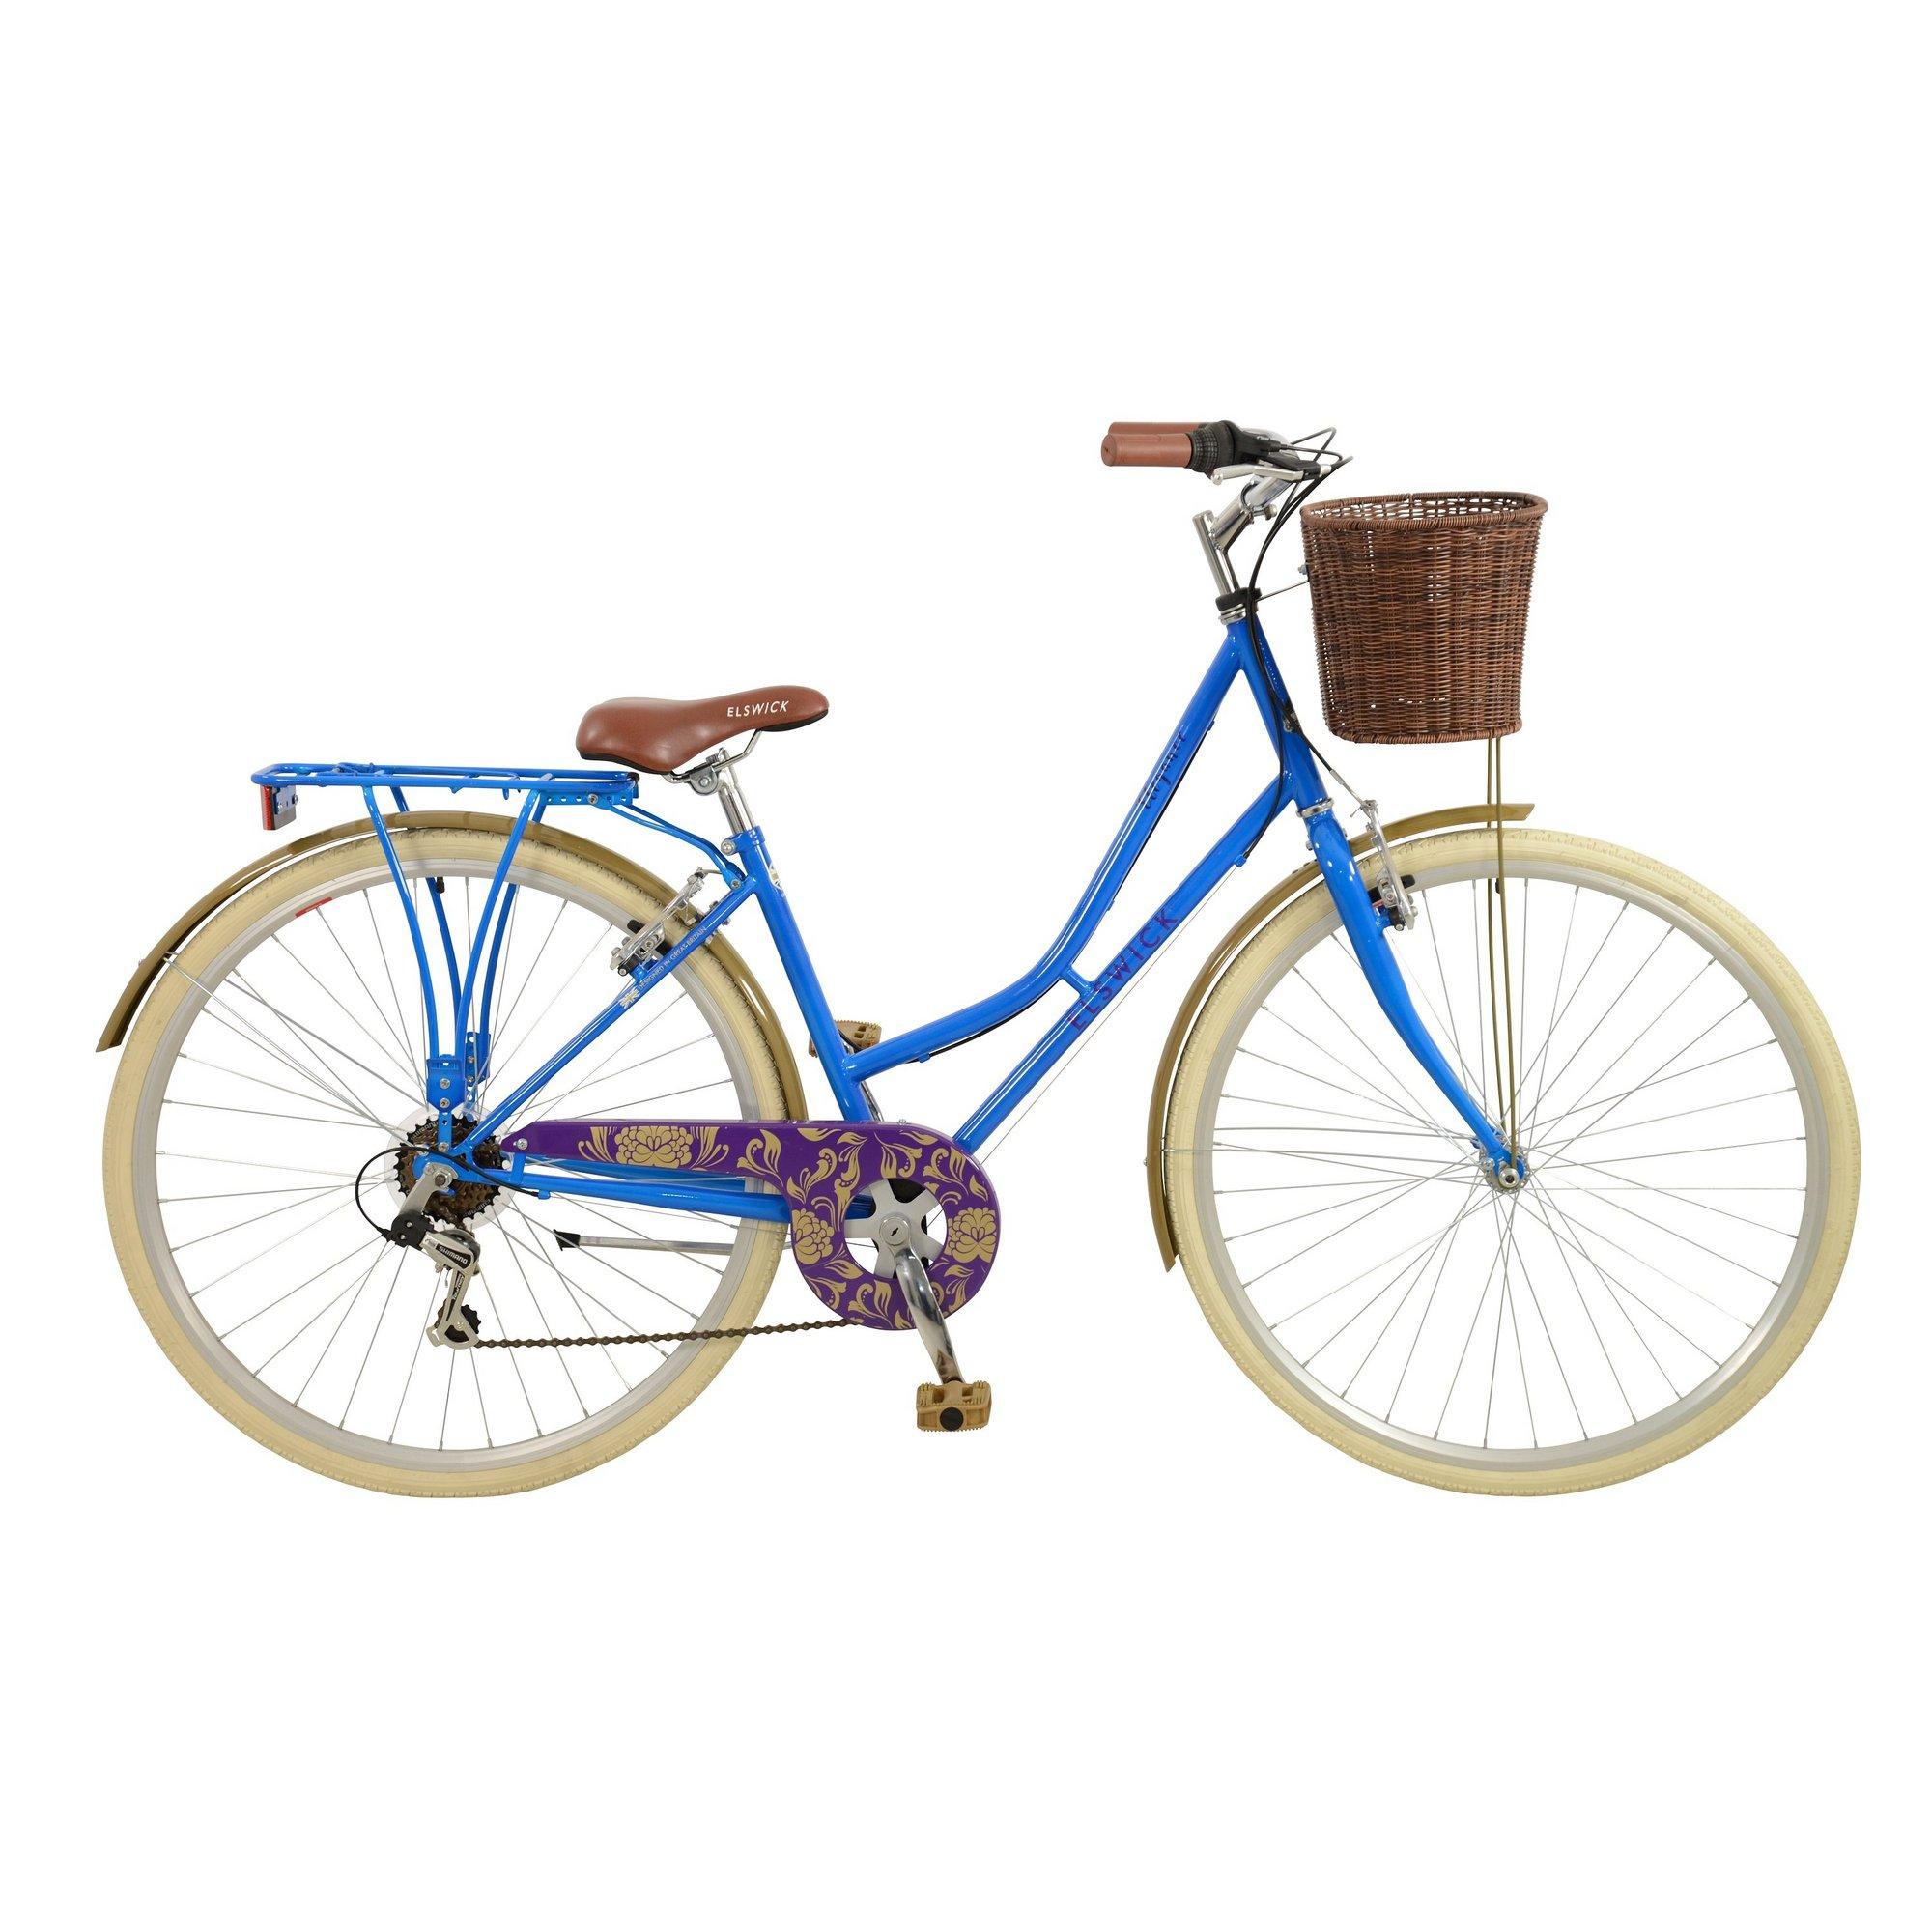 Image of Elswick Elegance Bike